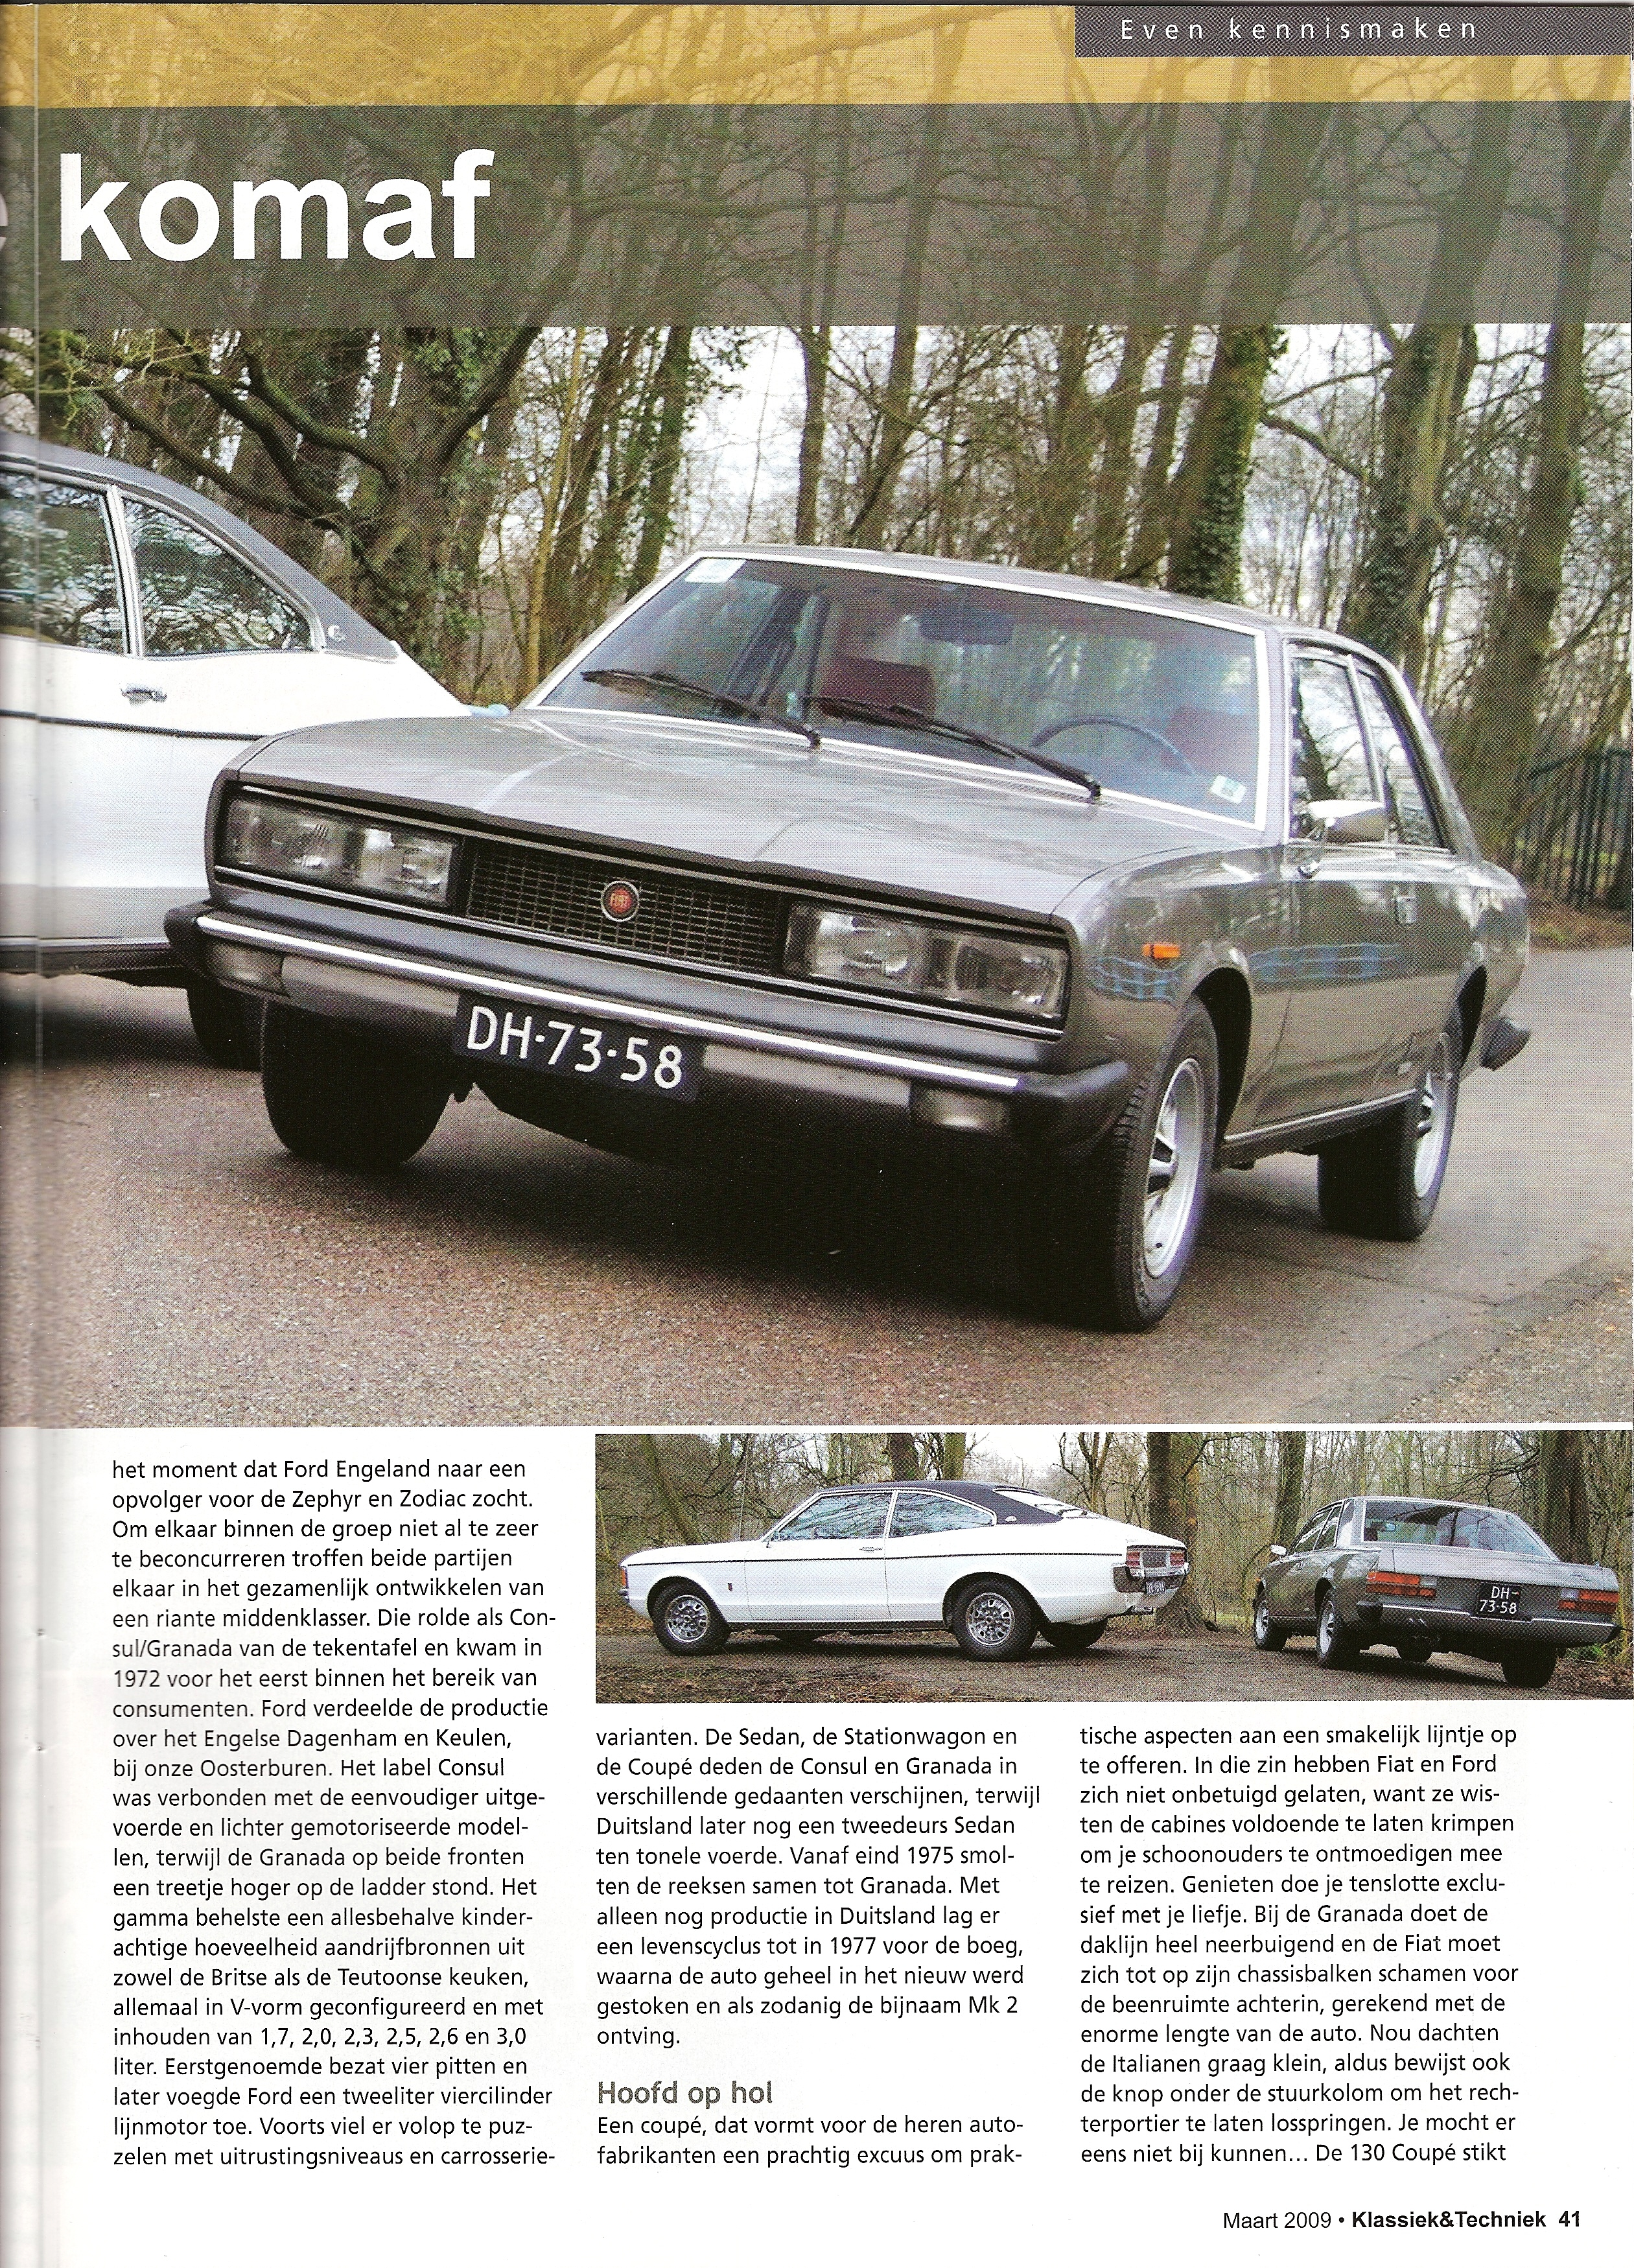 Klassiek & Techniek Fiat 130 Coupe en Ford Granada